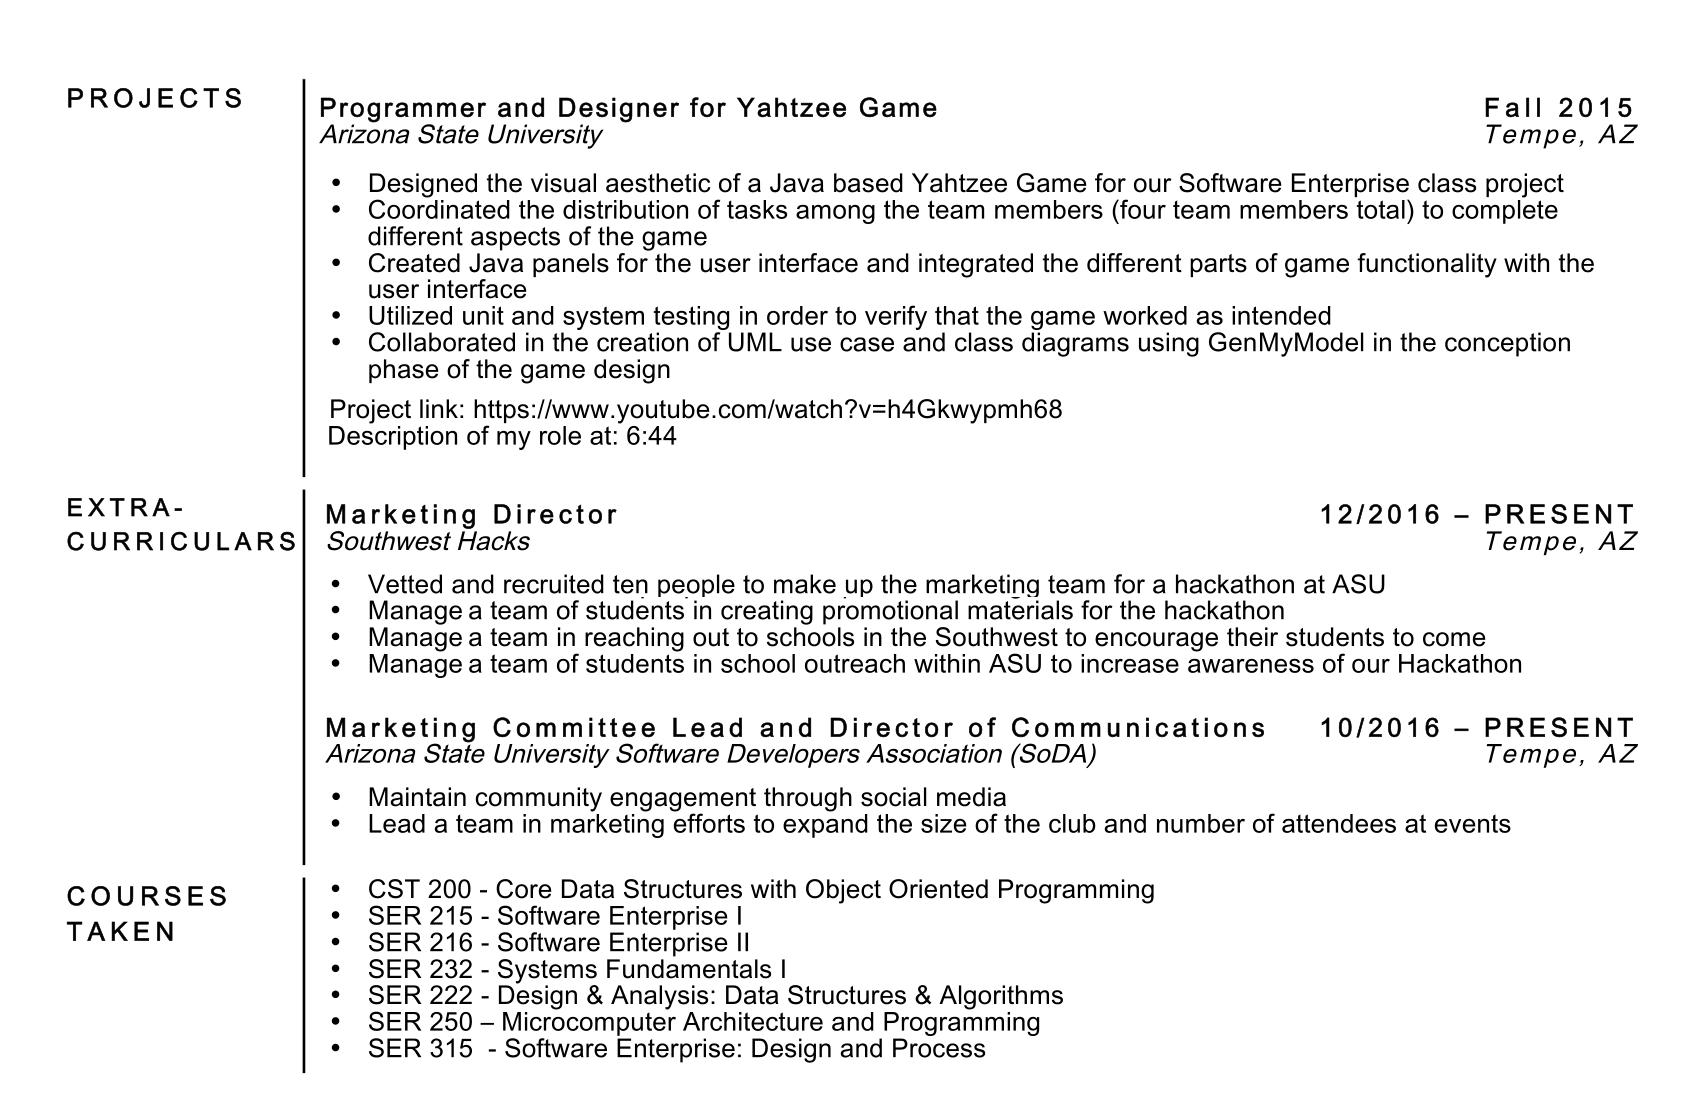 Programing Resume Resume Format Programmer Object Oriented Programmer  Resume Sample Livecareer